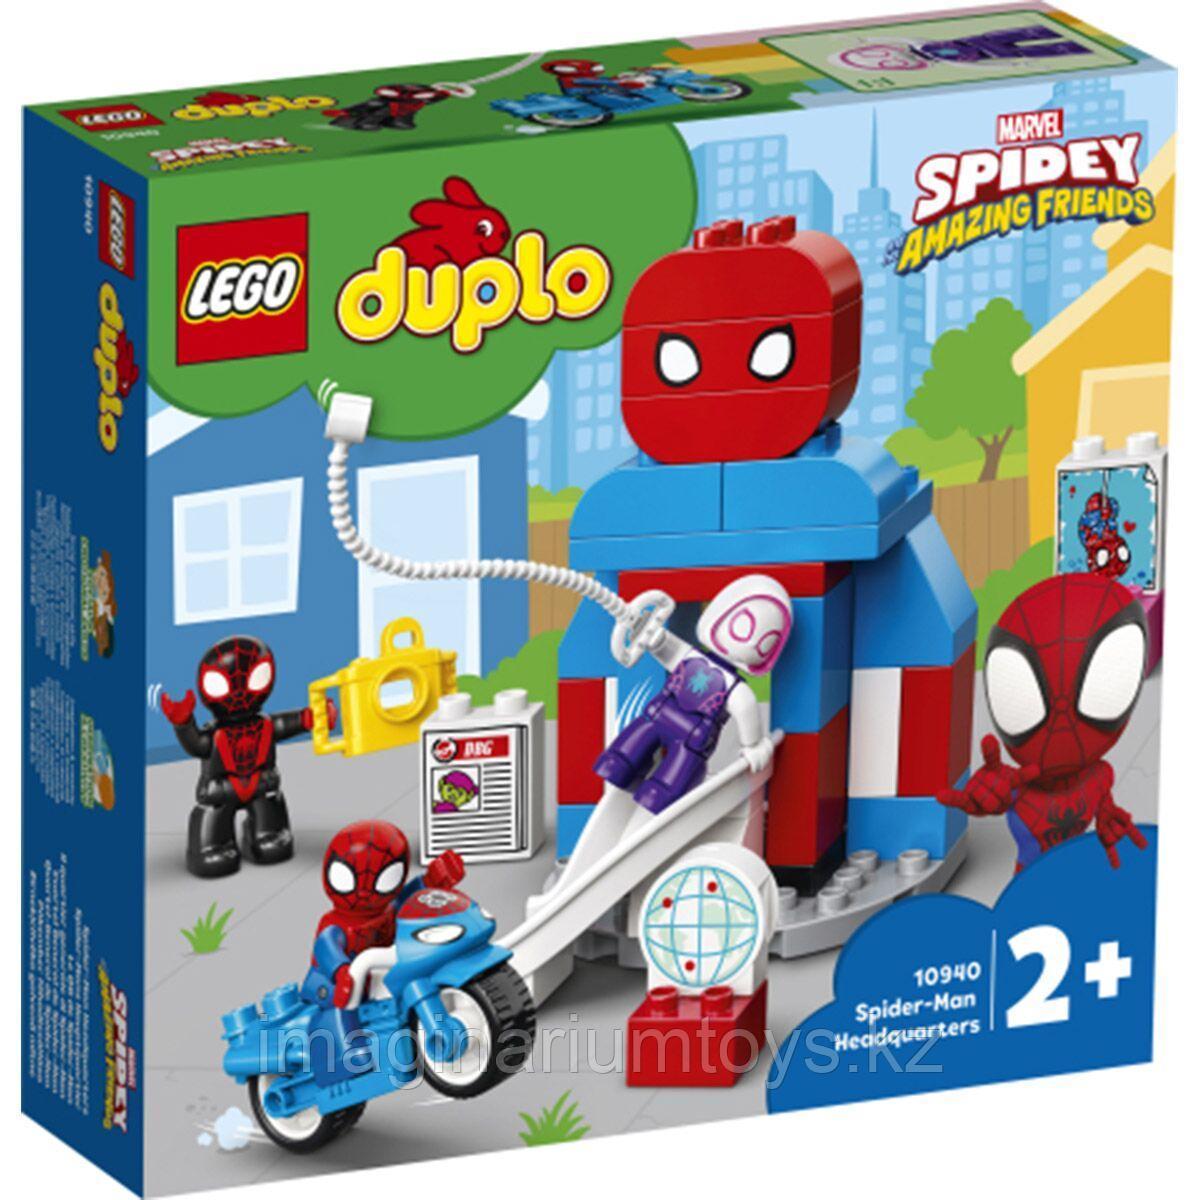 Конструктор LEGO Duplo Штаб-квартира Человека-паука